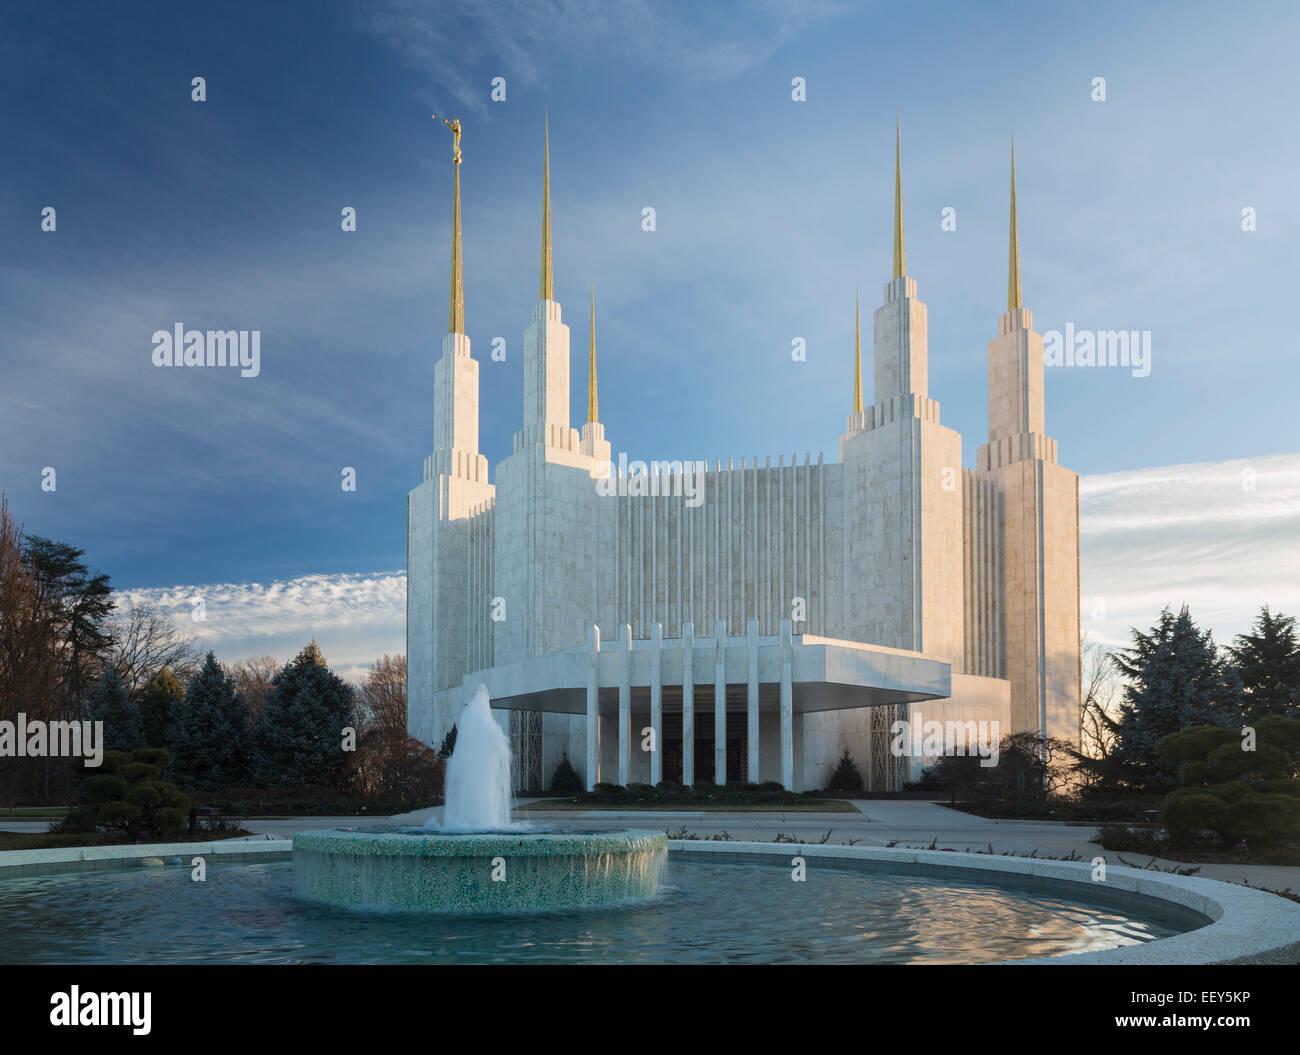 Washington DC Temple or Church of Jesus Christ of  Latter-day Saints in Kensington, Maryland, USA - Stock Image